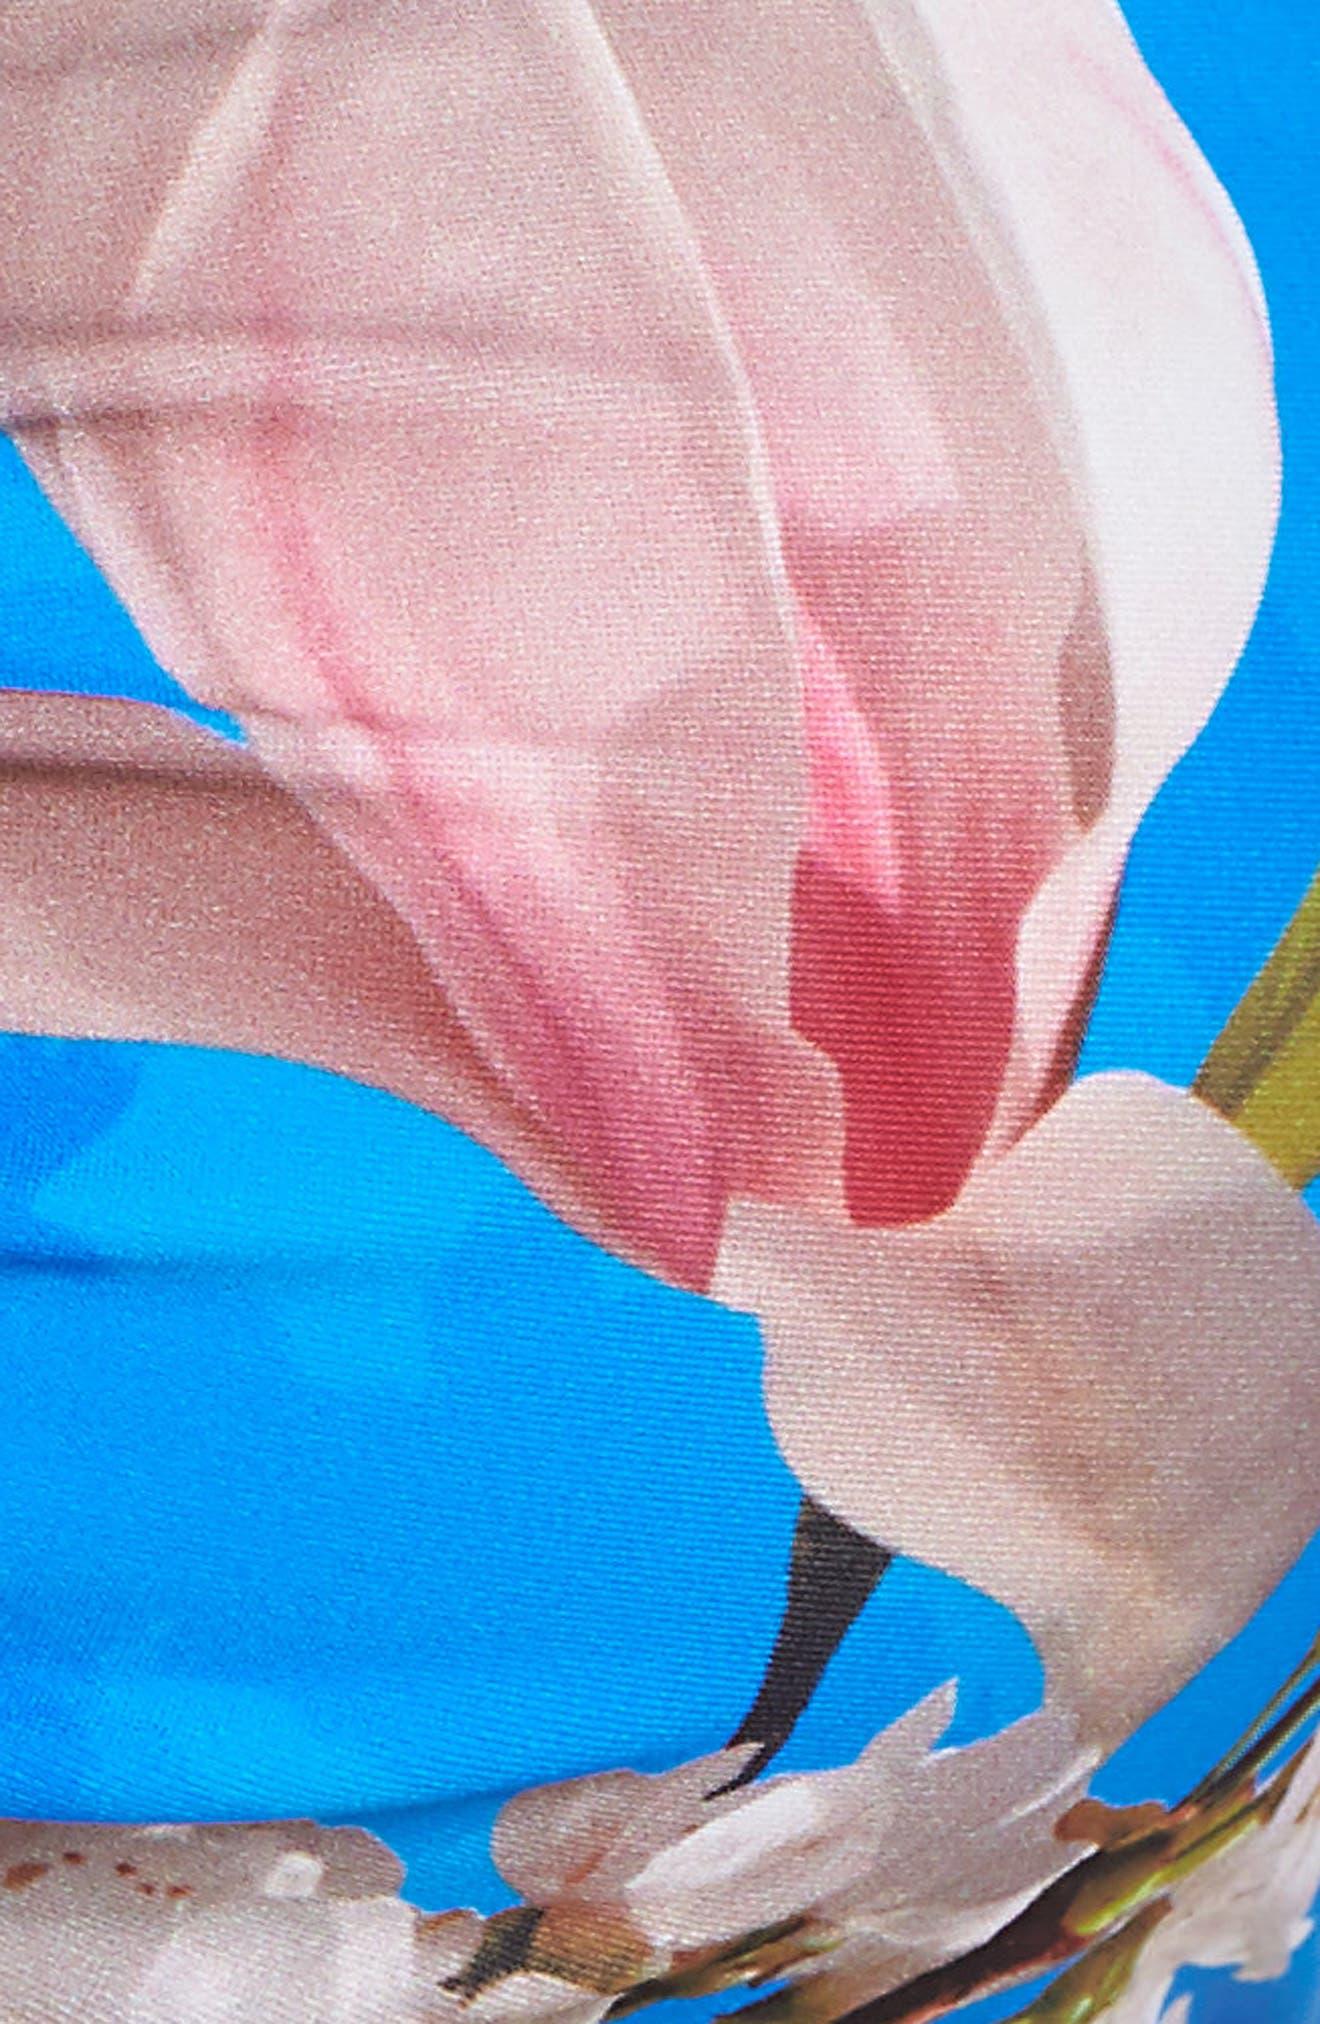 Harmony Strapless Bikini Top,                             Alternate thumbnail 6, color,                             BRIGHT BLUE